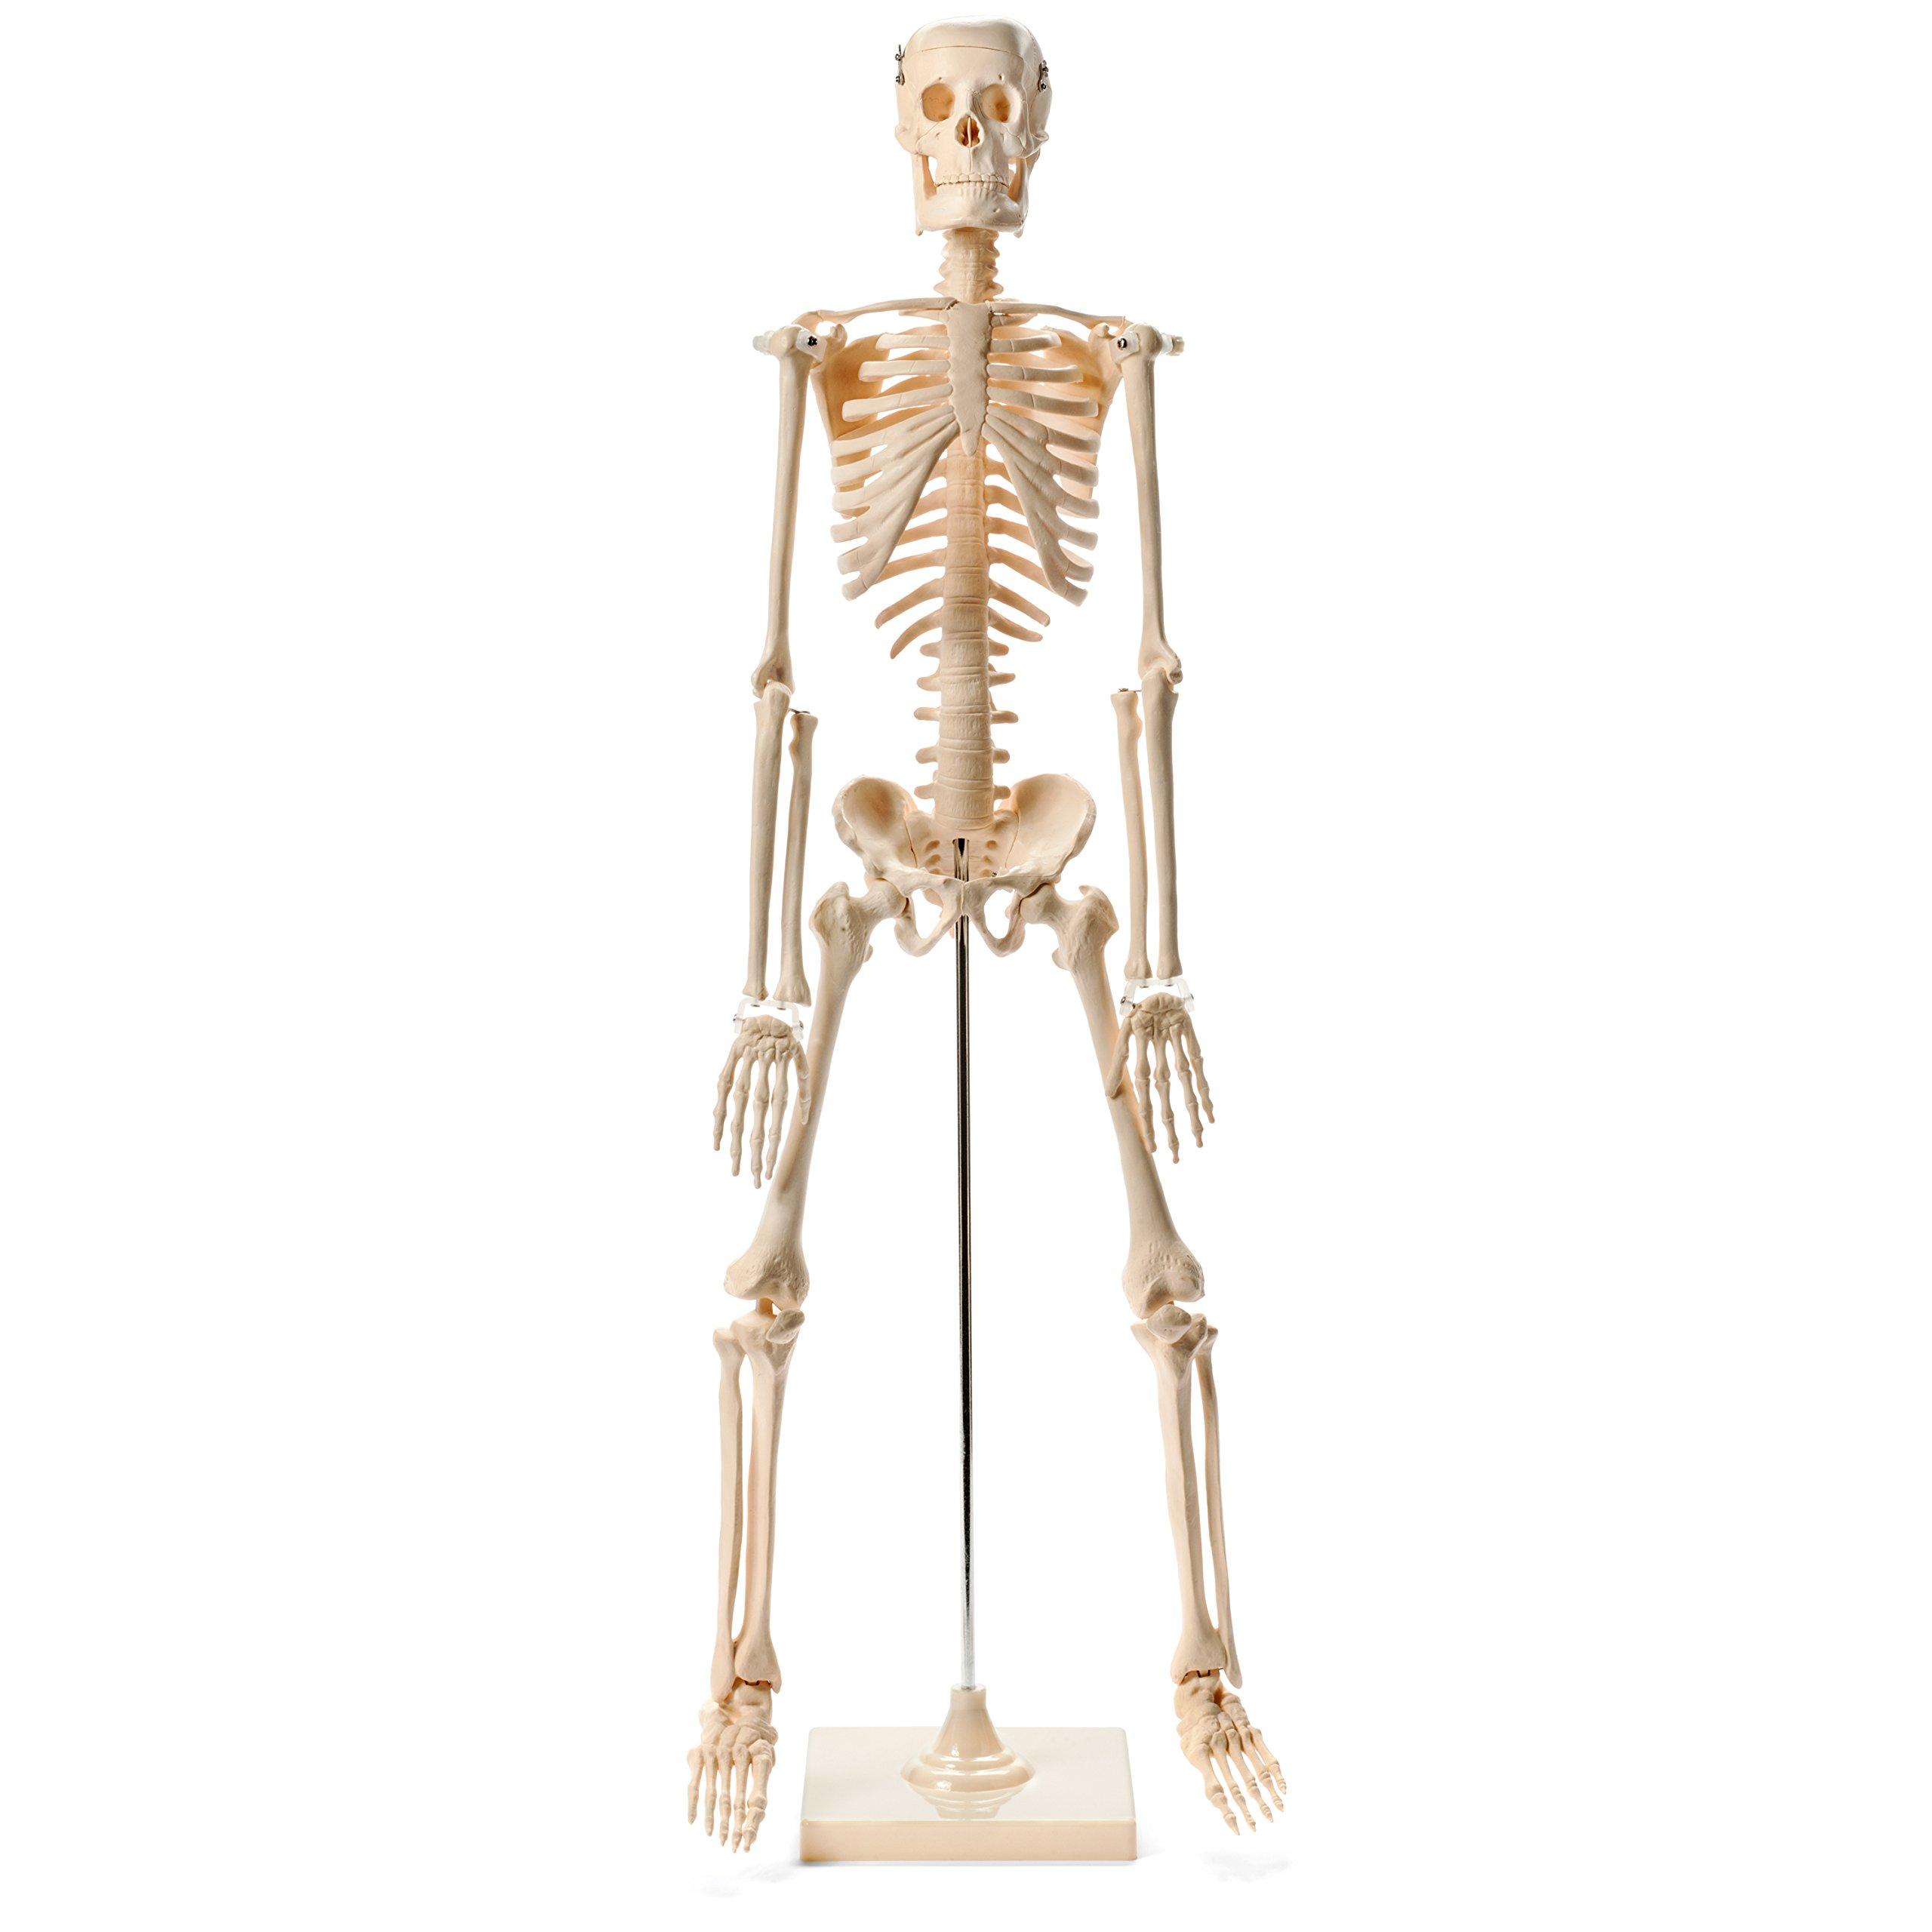 Medical Quality Human Skeleton Model - 1/2 Life Sized - 85 cm with Metal Base